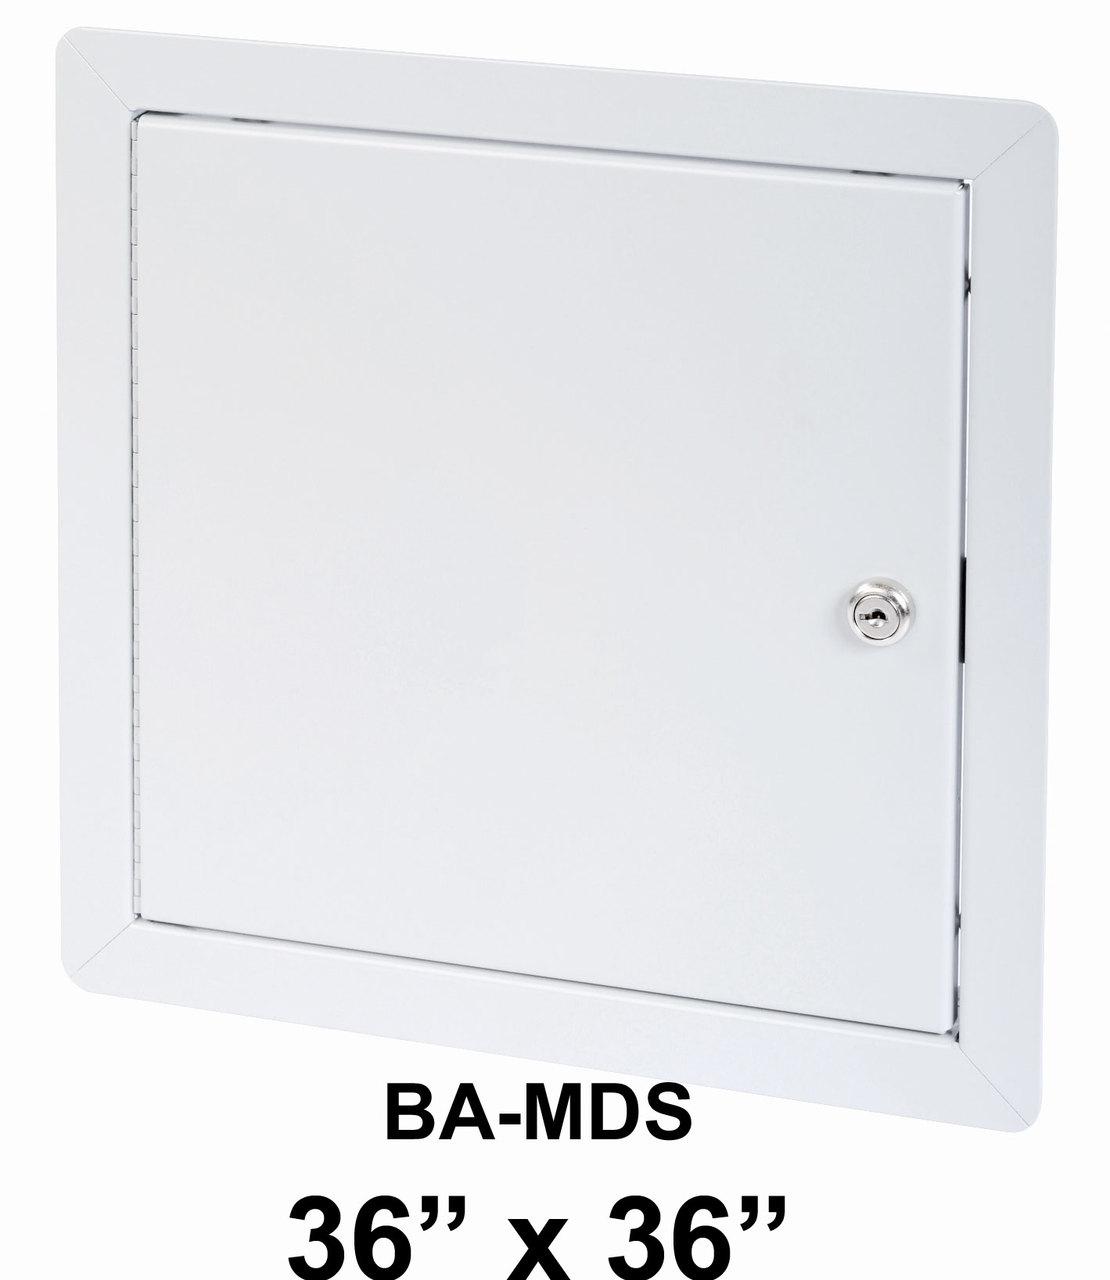 BA-MDS Best Access Doors 36 x 36 Medium Security Access Panel